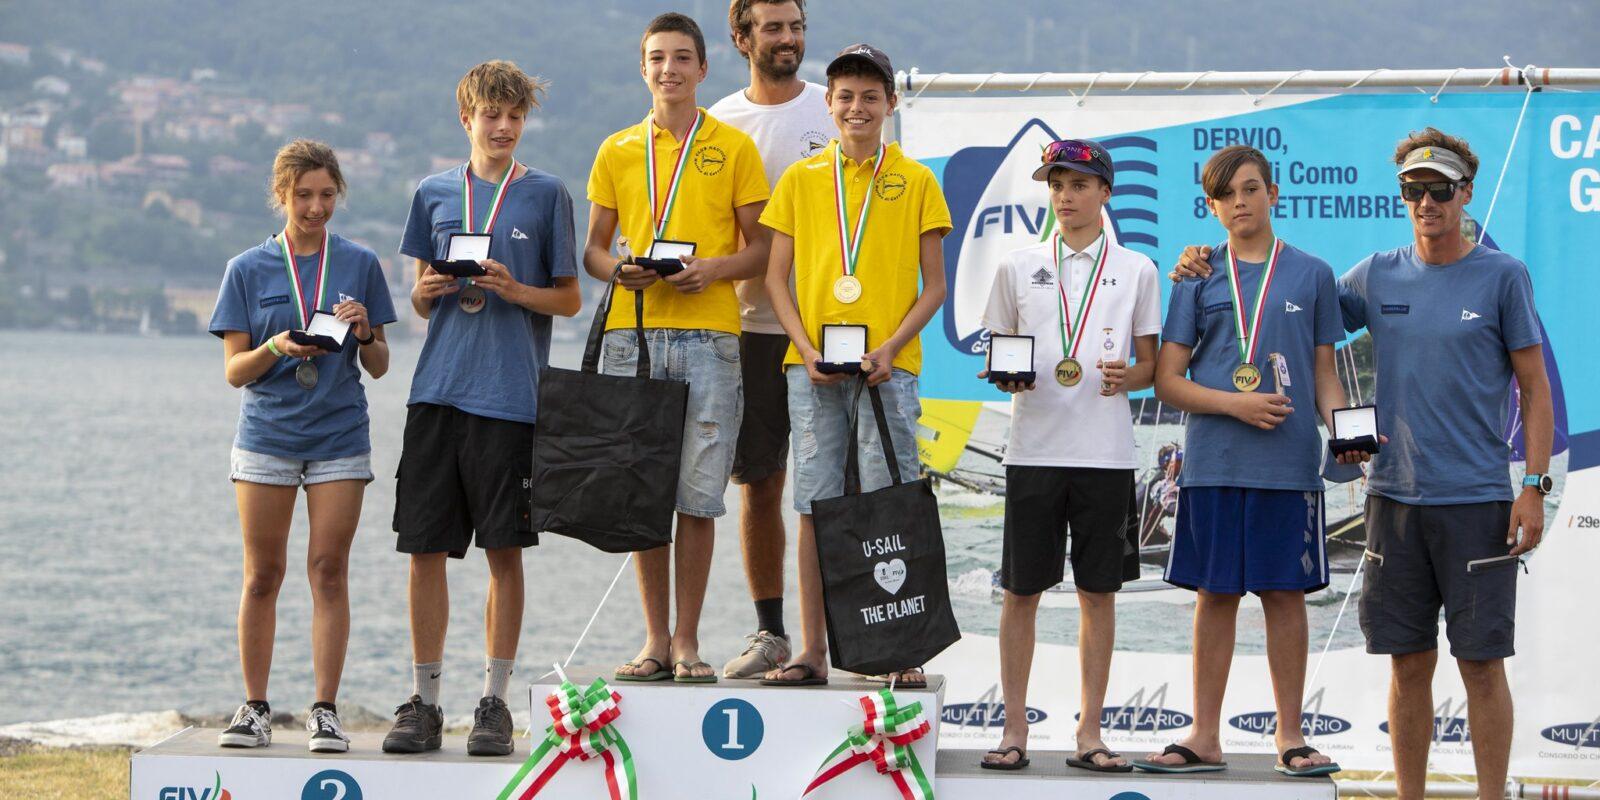 edoardo alex brighenti terzo posto campionati italiani rsfeva dervio 2021